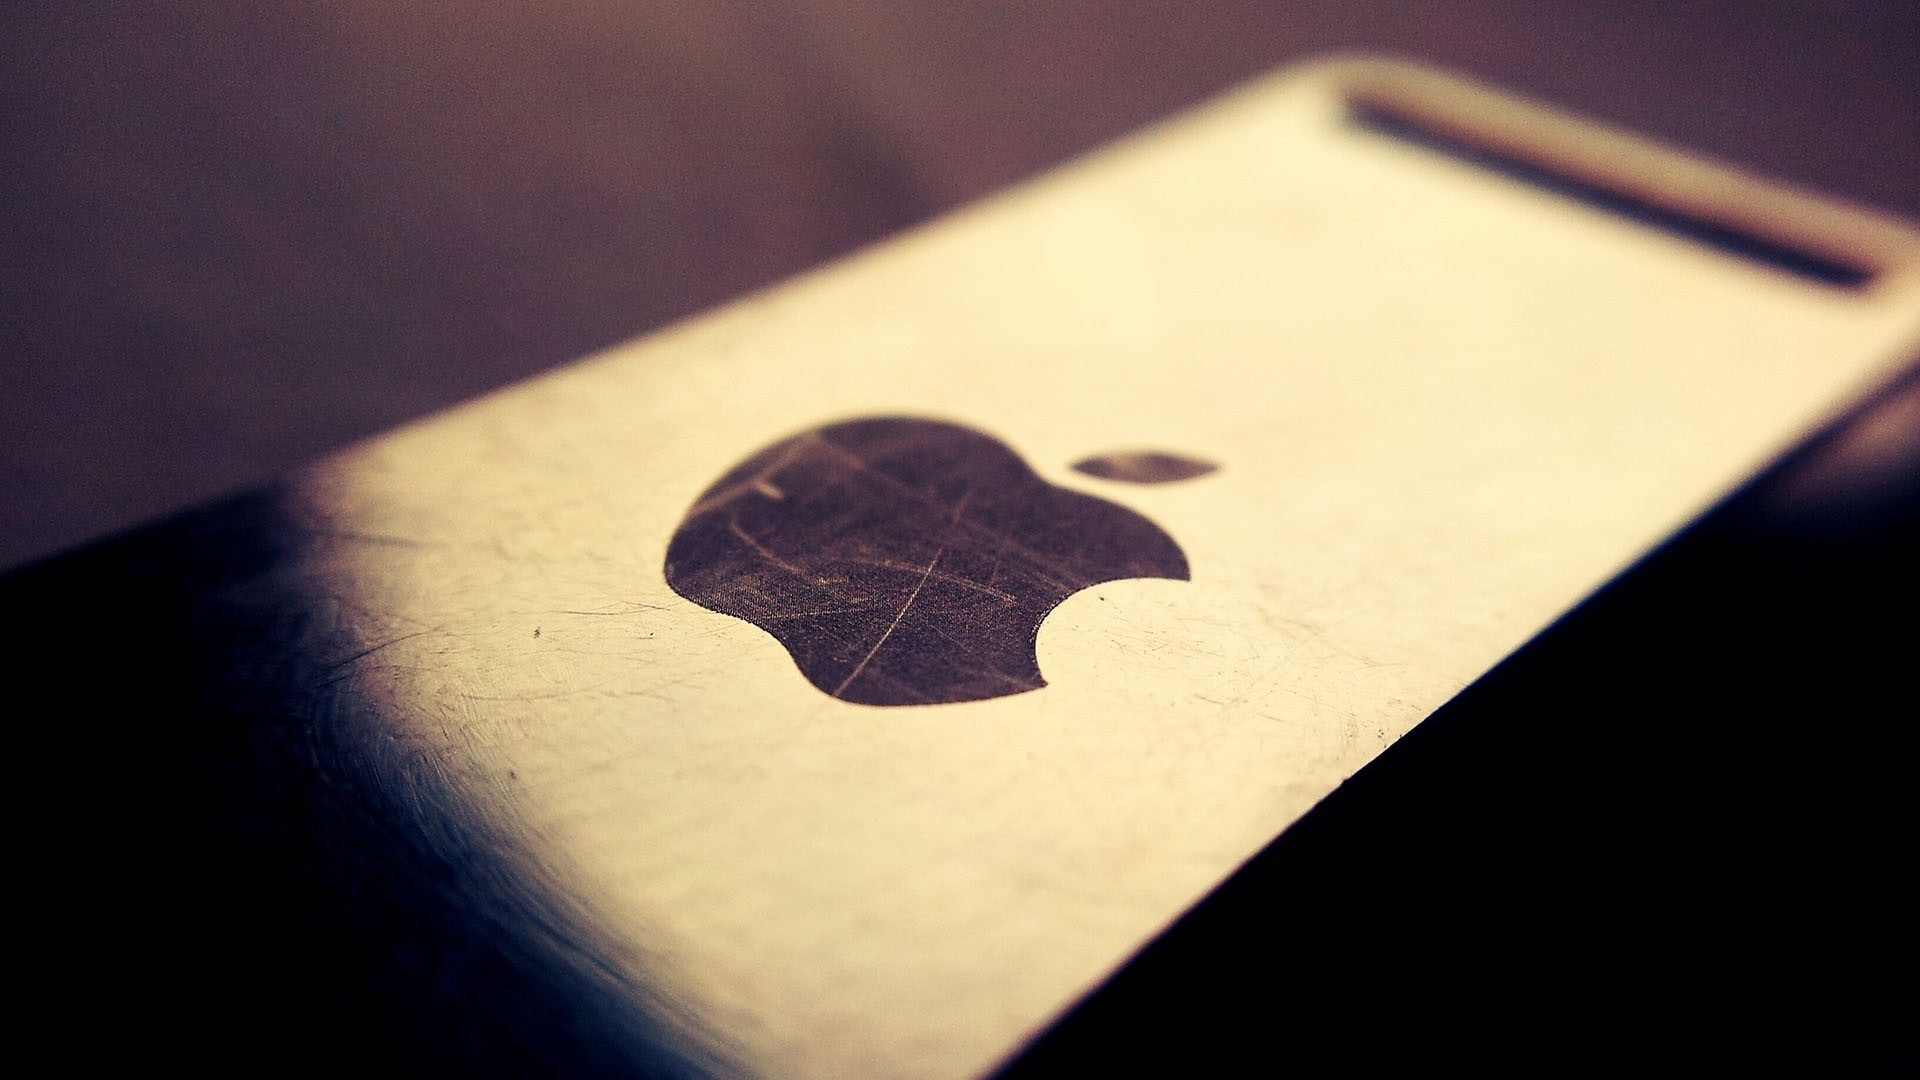 Apple Ipad background image